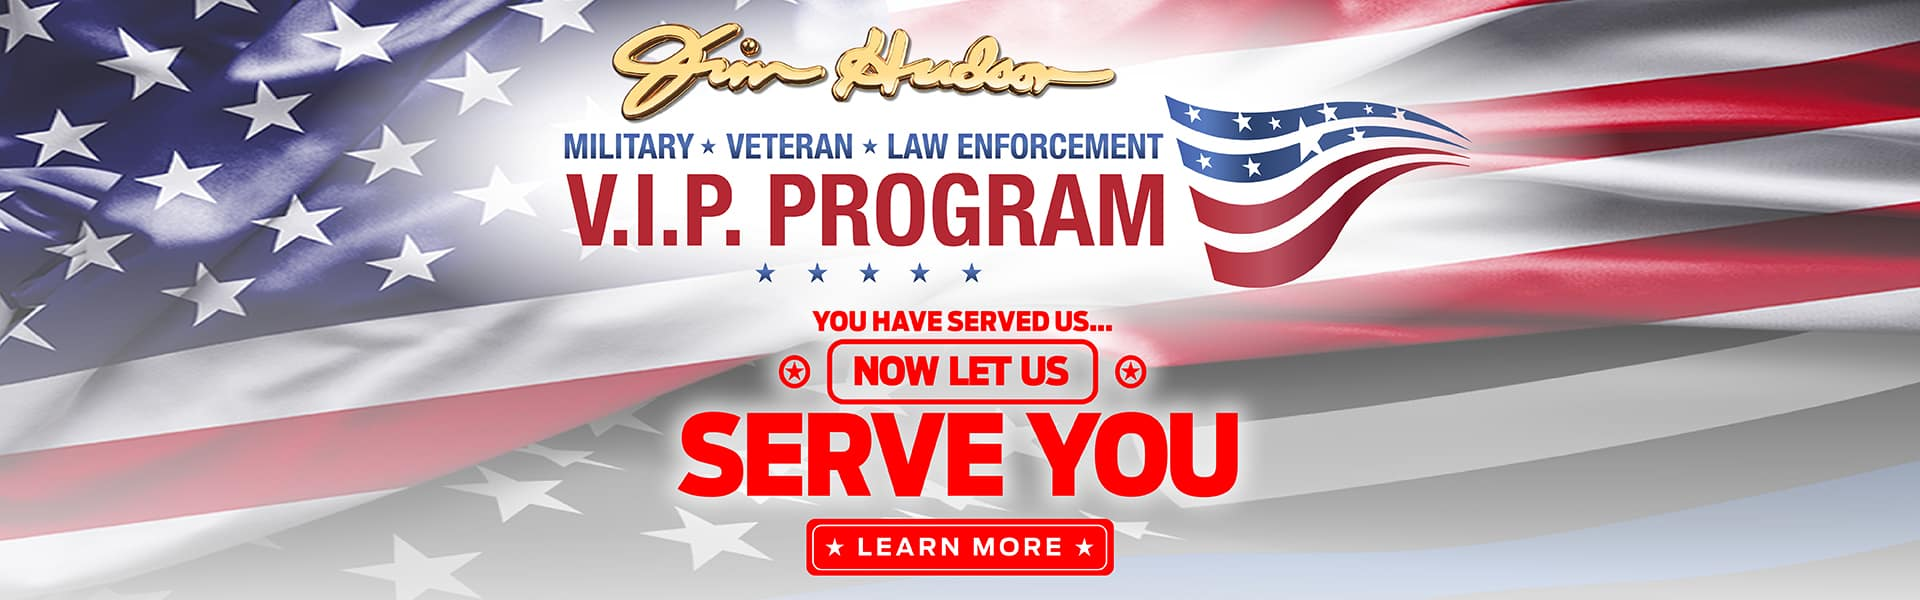 VIP Military Program